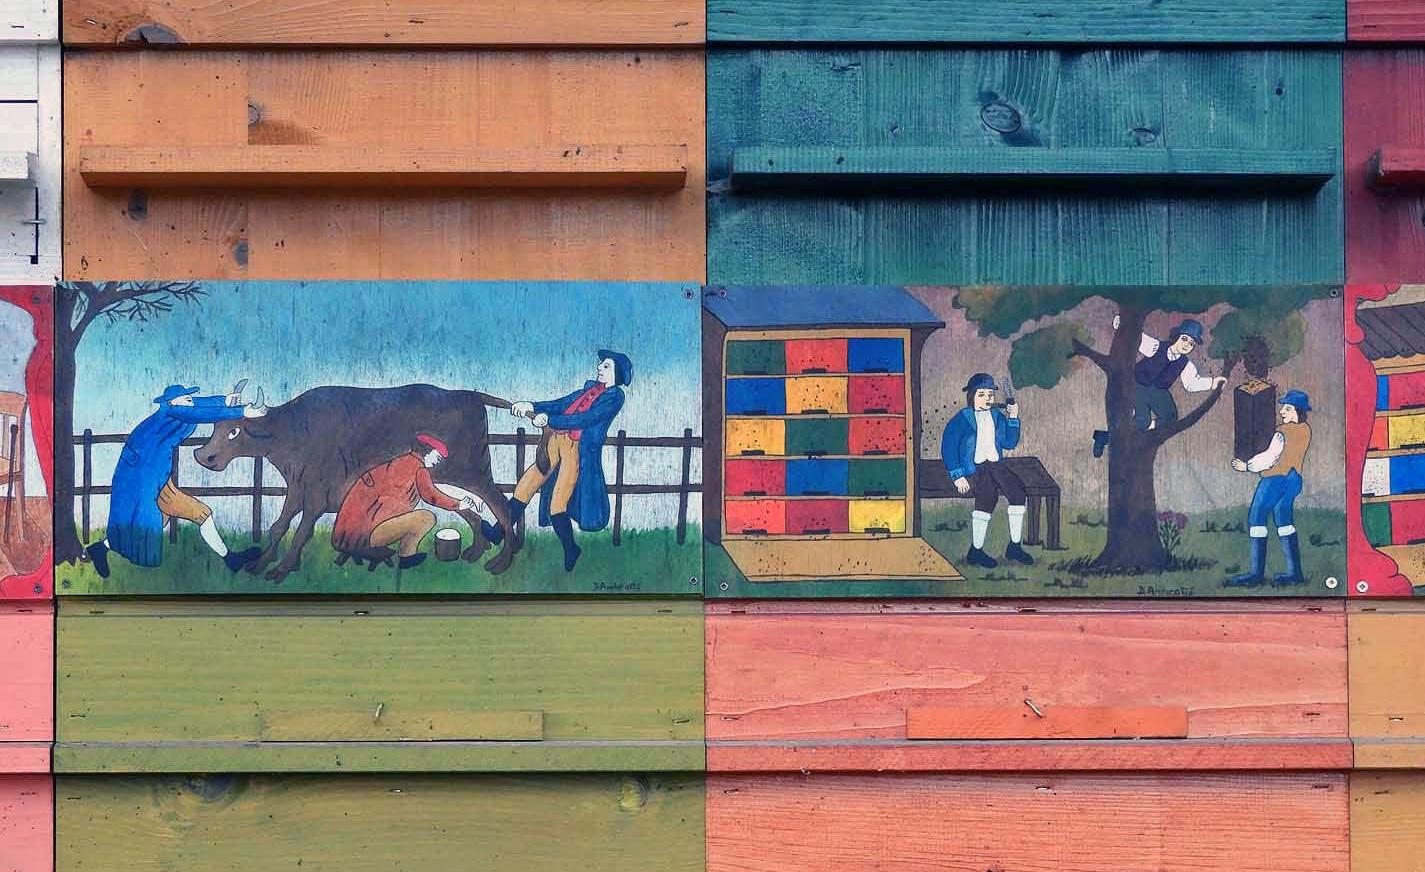 slovenia-triglav-national-park-beehive-painting-traditional.JPG